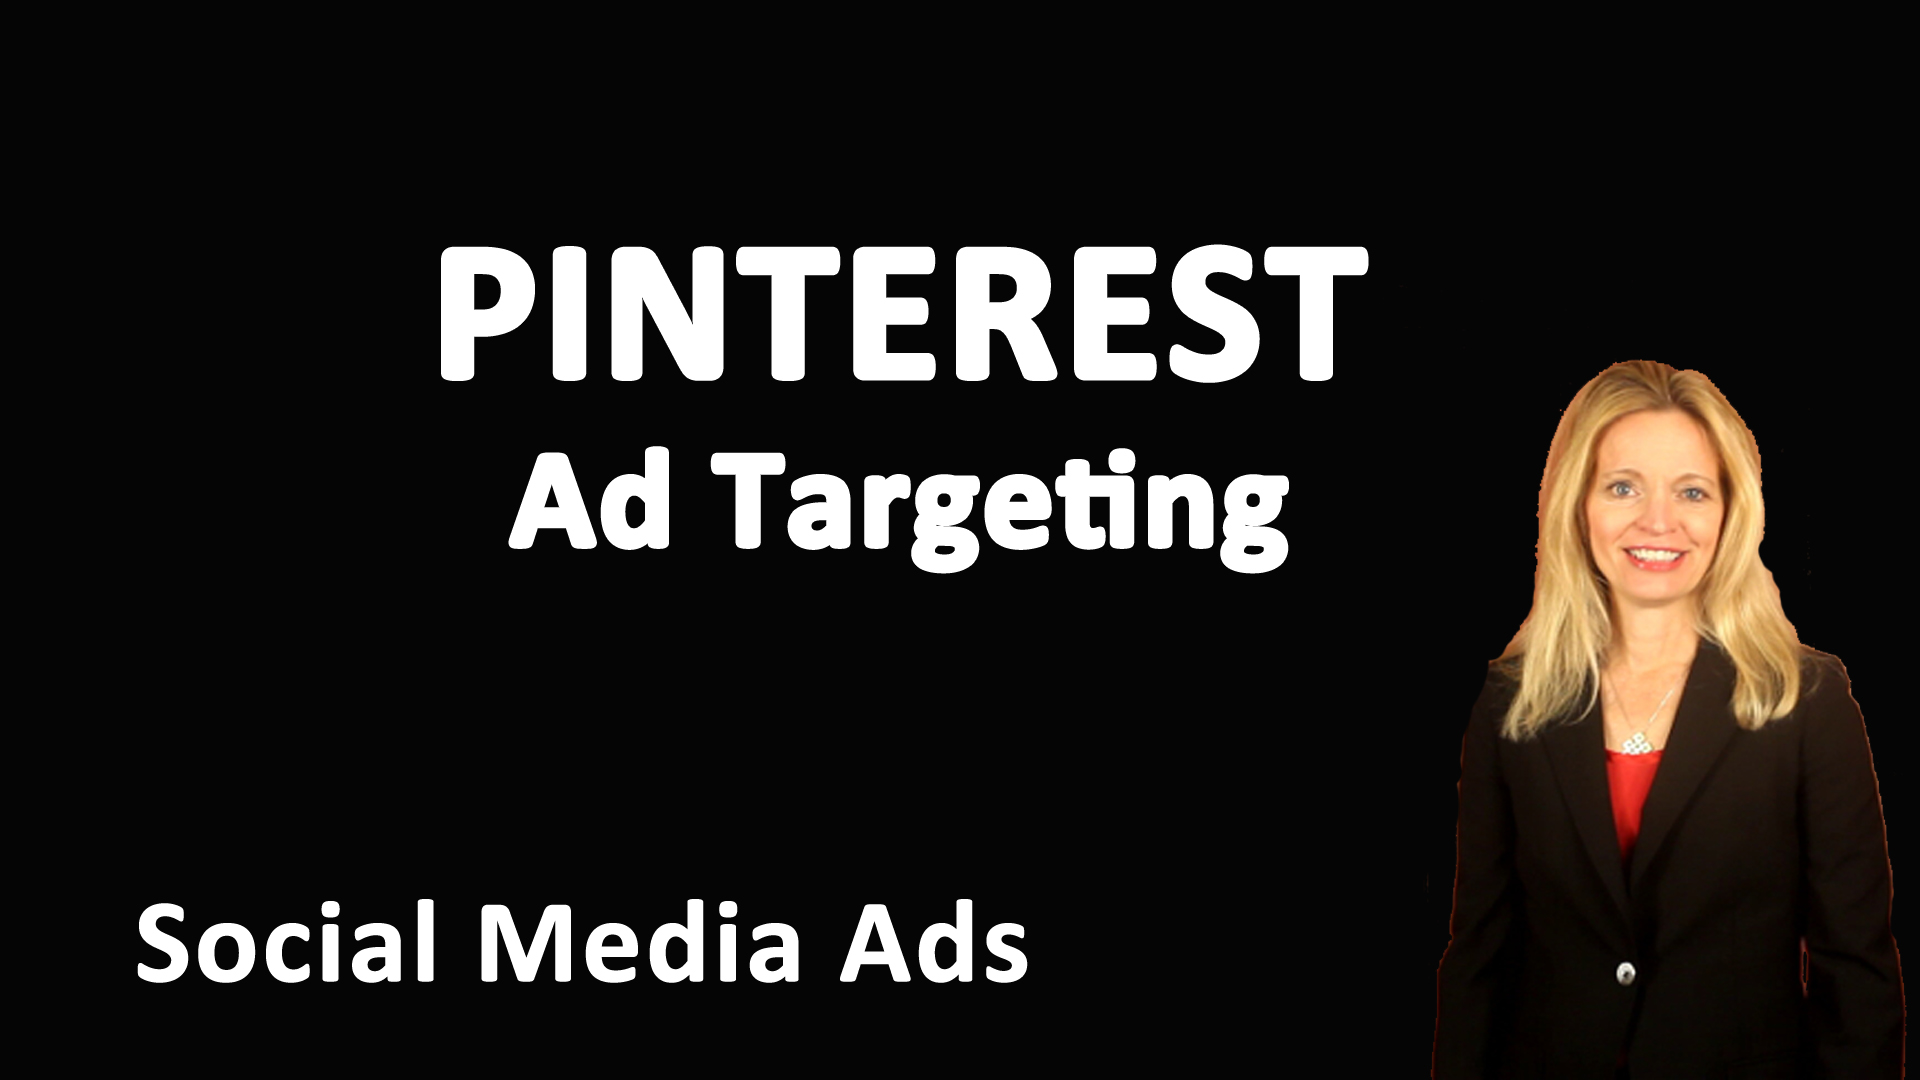 Pinterest-ad-targeting